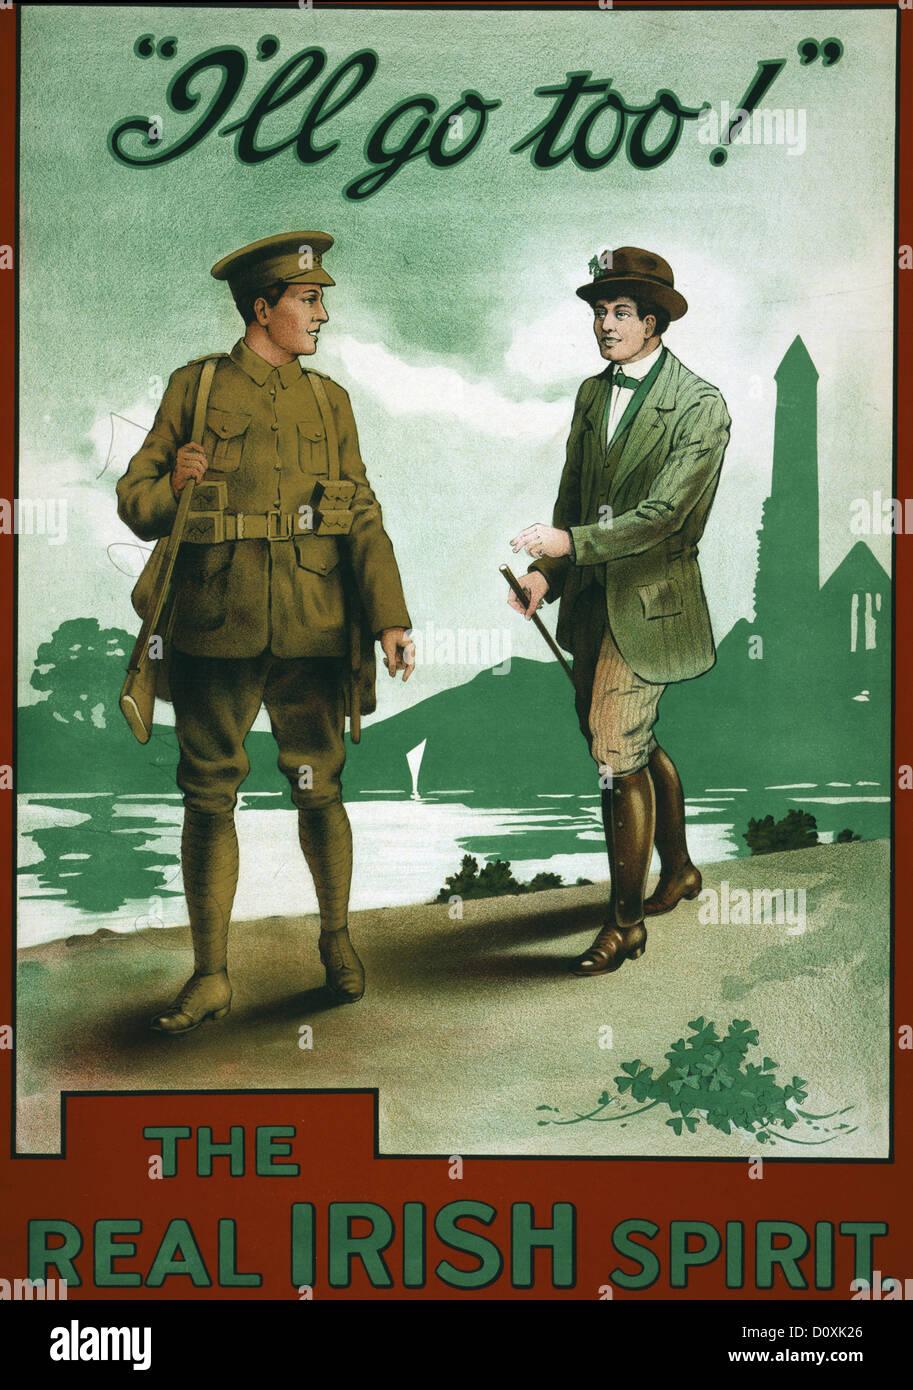 Ireland, World War I, recruitment, poster, green, shamrocks, soldier, Irish spirit, 1915 - Stock Image